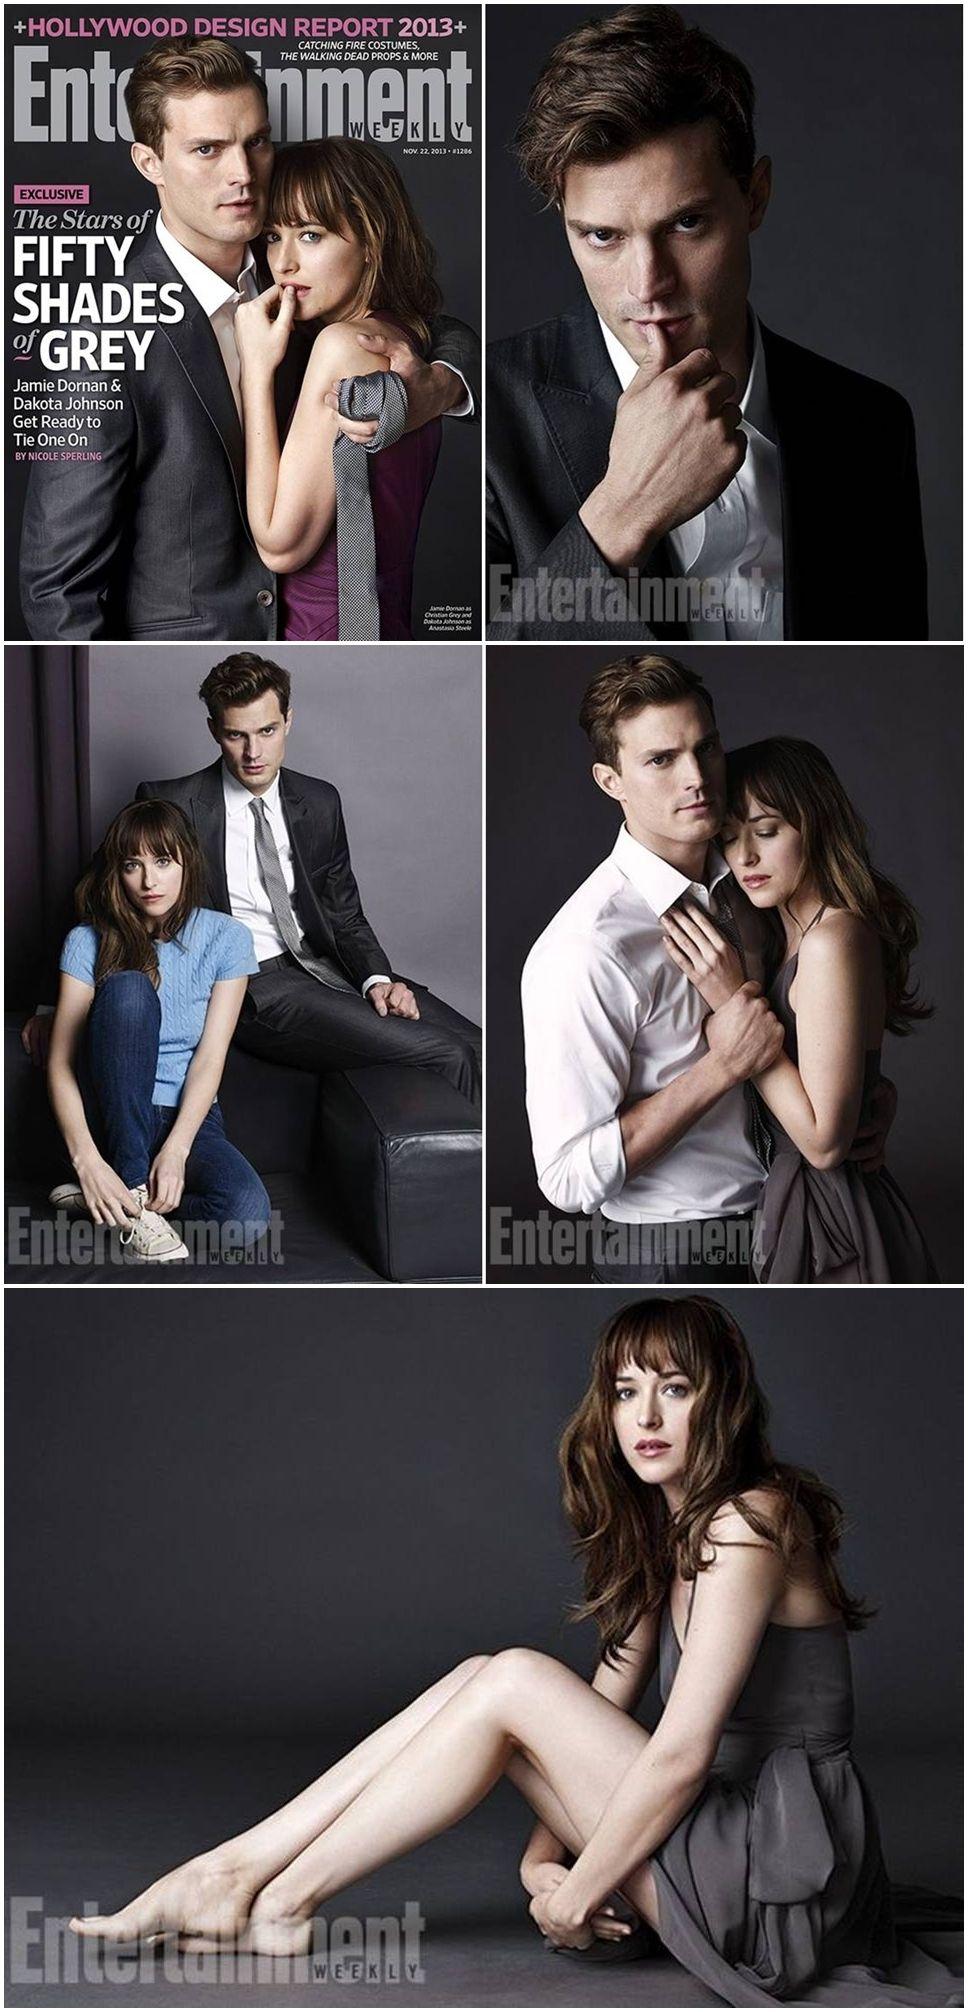 Fifty Shades Of Grey First Character Photos Jamie Dornan As Christian Grey And Dakota Johnson Fifty Shades Movie Fifty Shades Trilogy Shades Of Grey Book